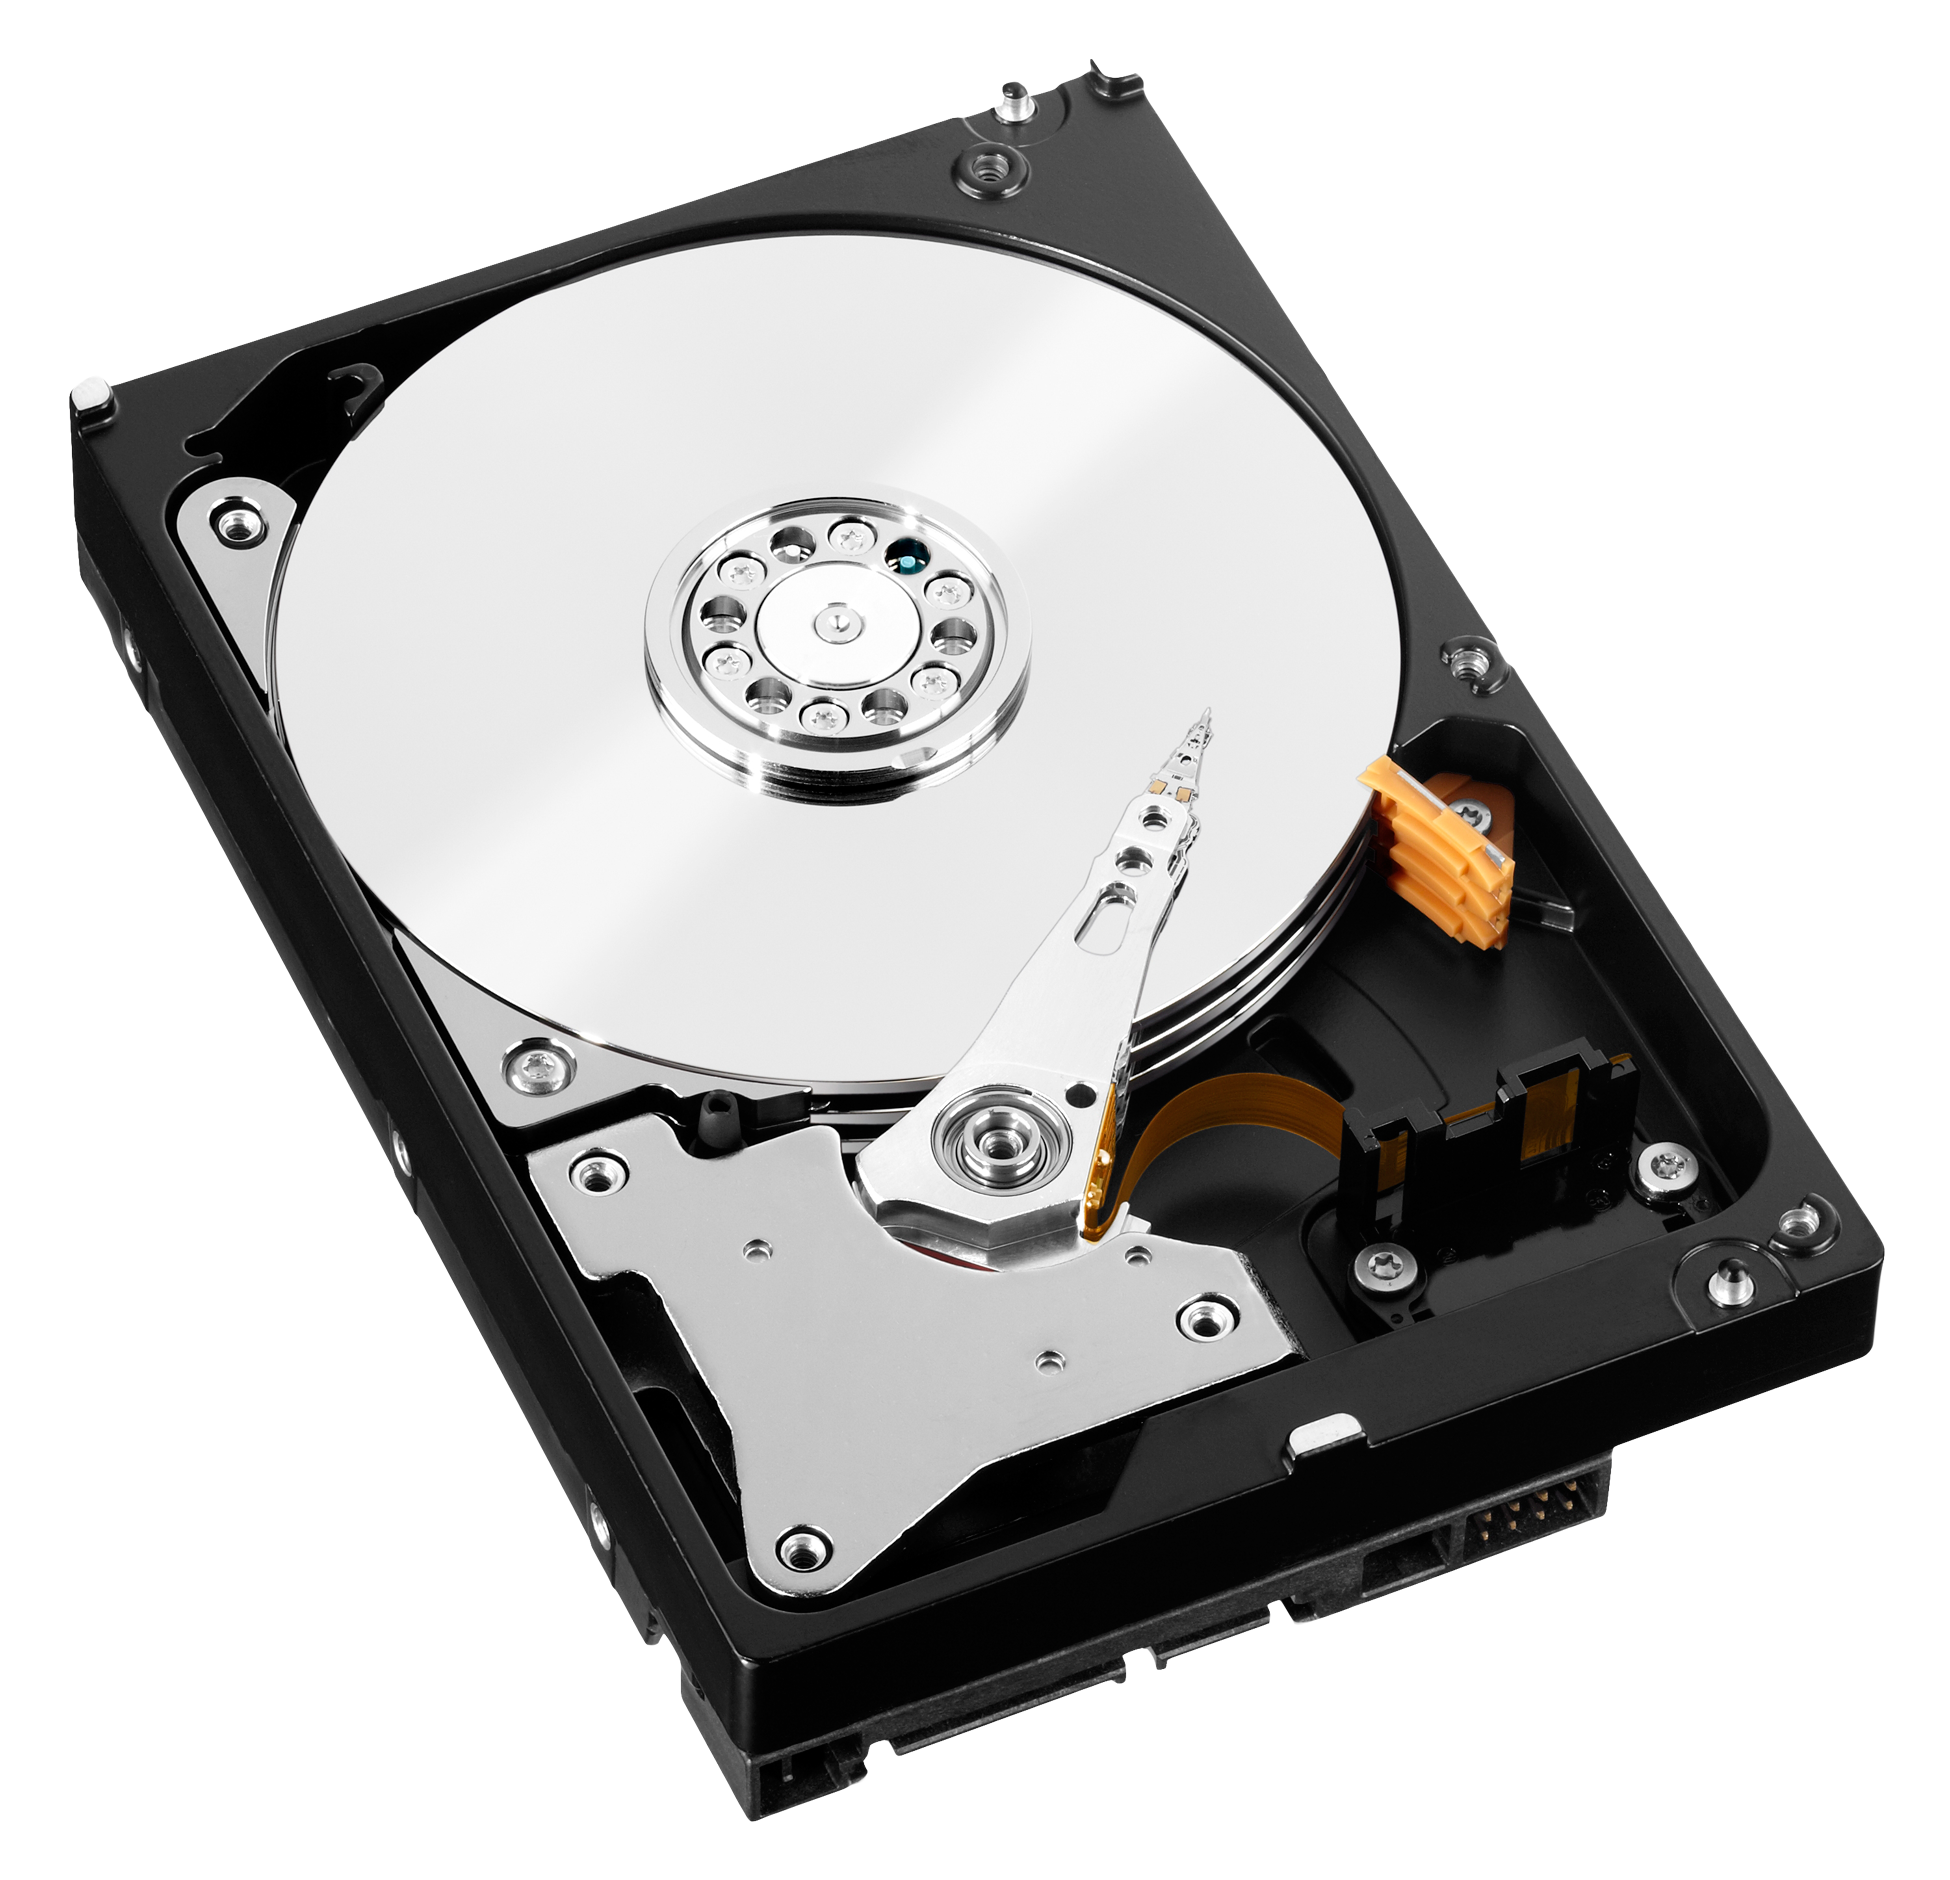 HDD Hard Disk Drive PNG Image.